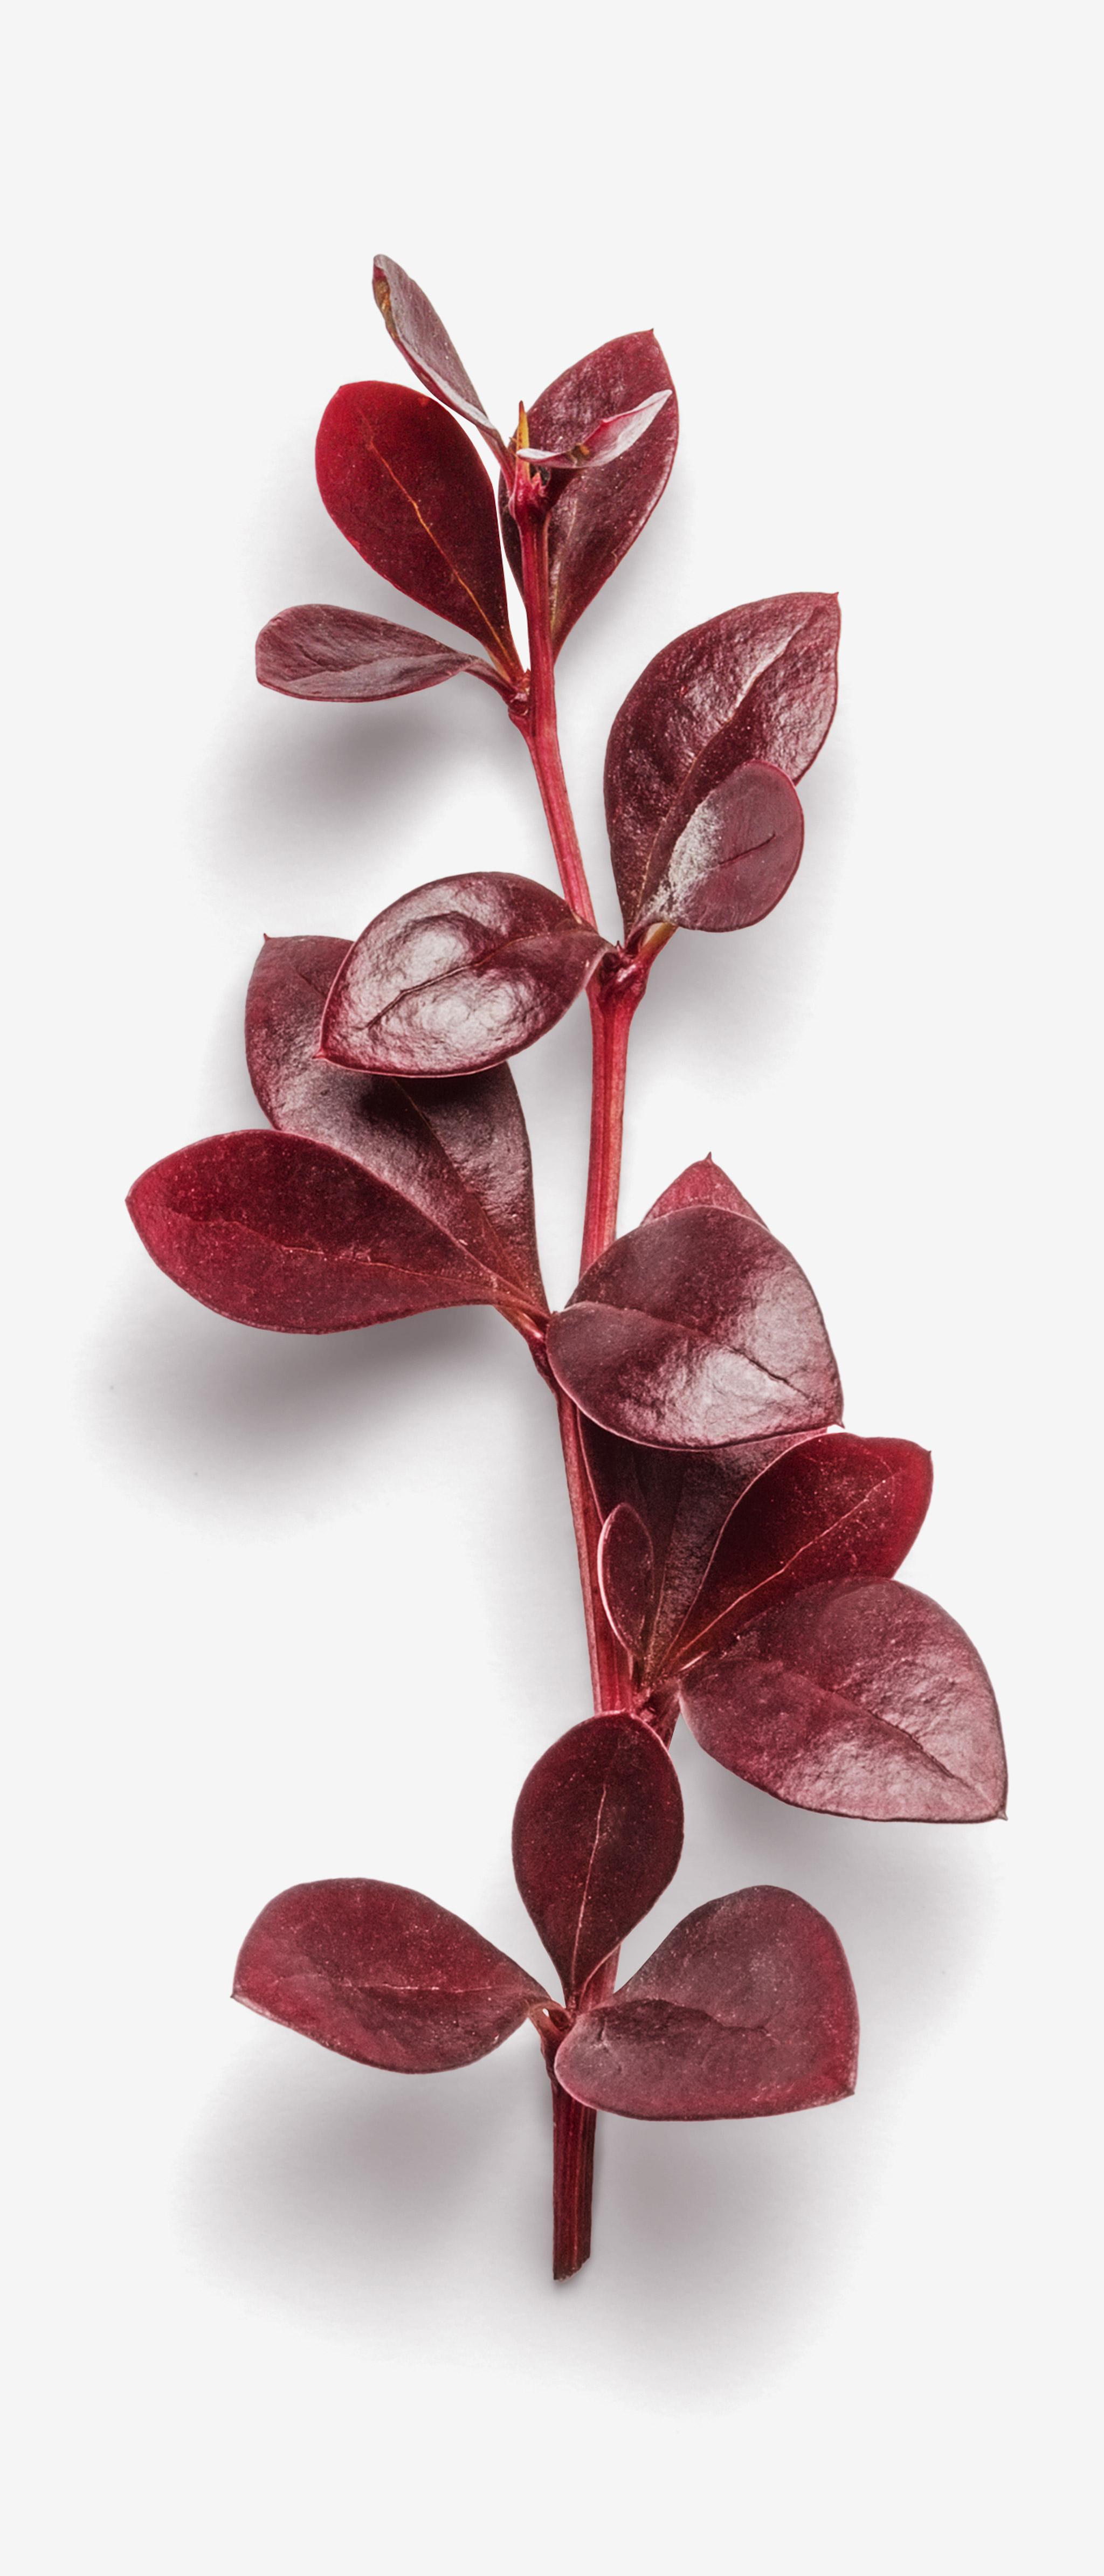 Leaf PSD layered image